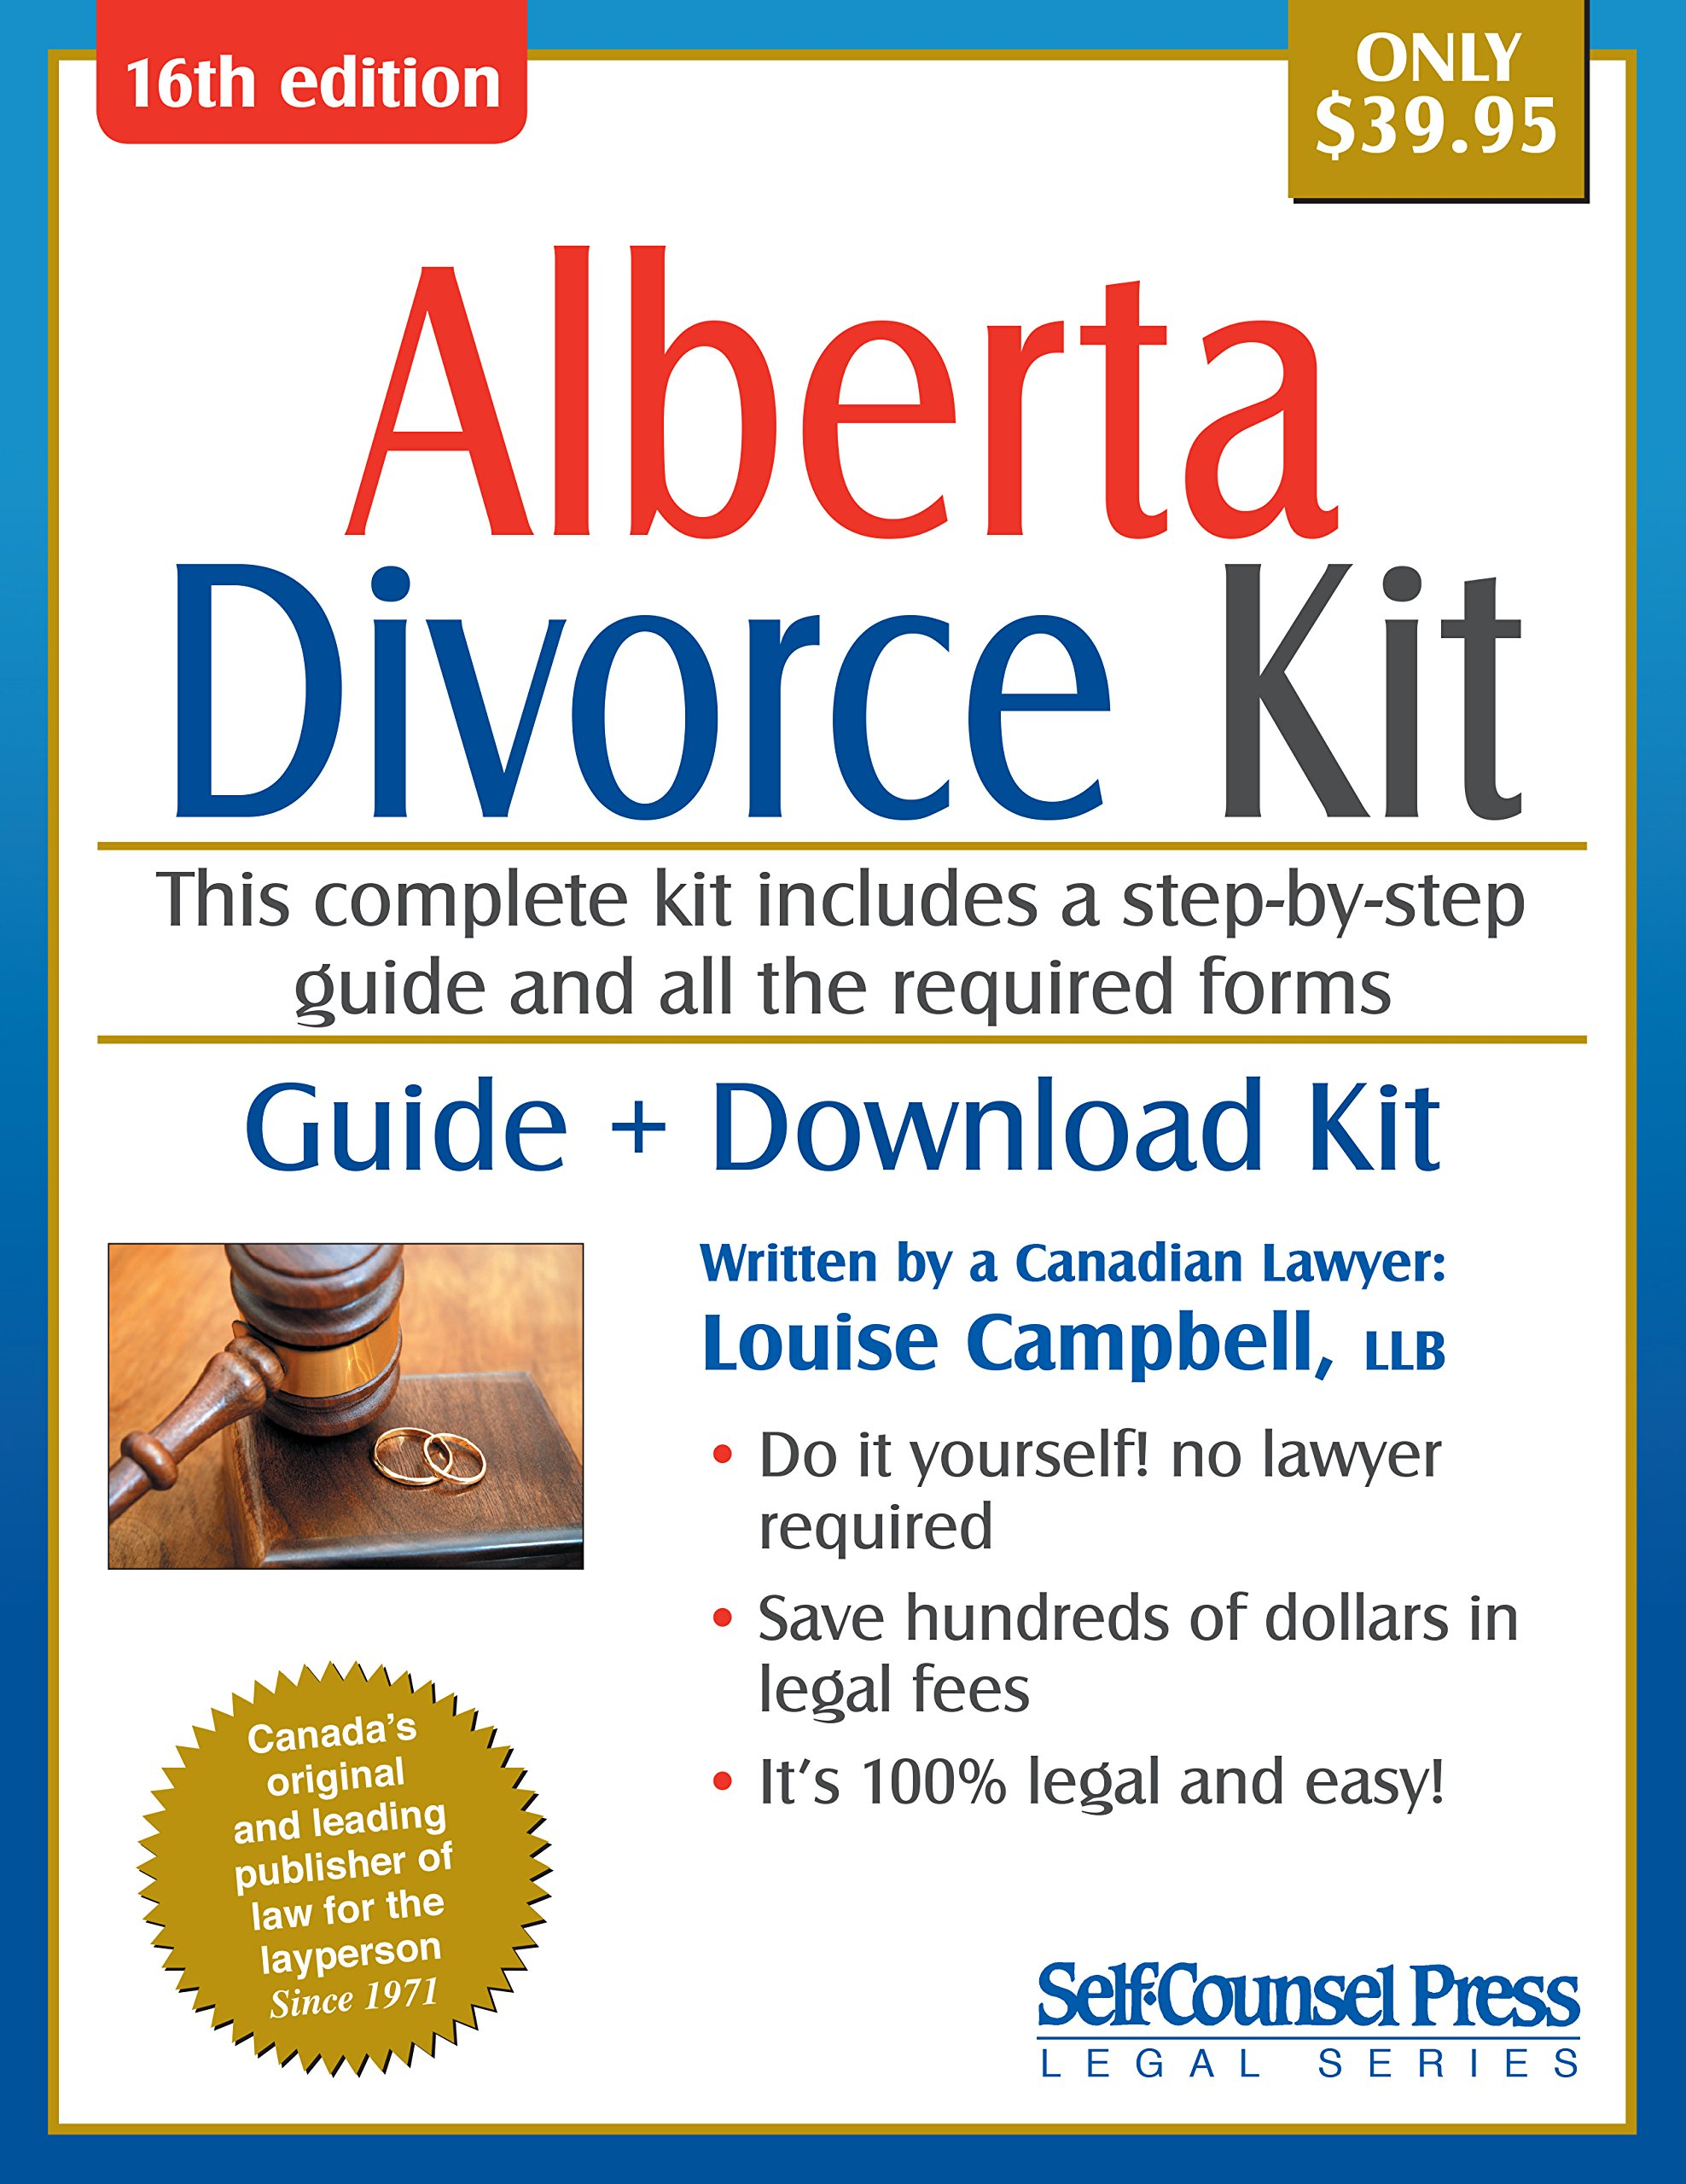 Divorce kit for alberta guide download kit alison sawyer divorce kit for alberta guide download kit alison sawyer 0069635806289 books amazon solutioingenieria Image collections